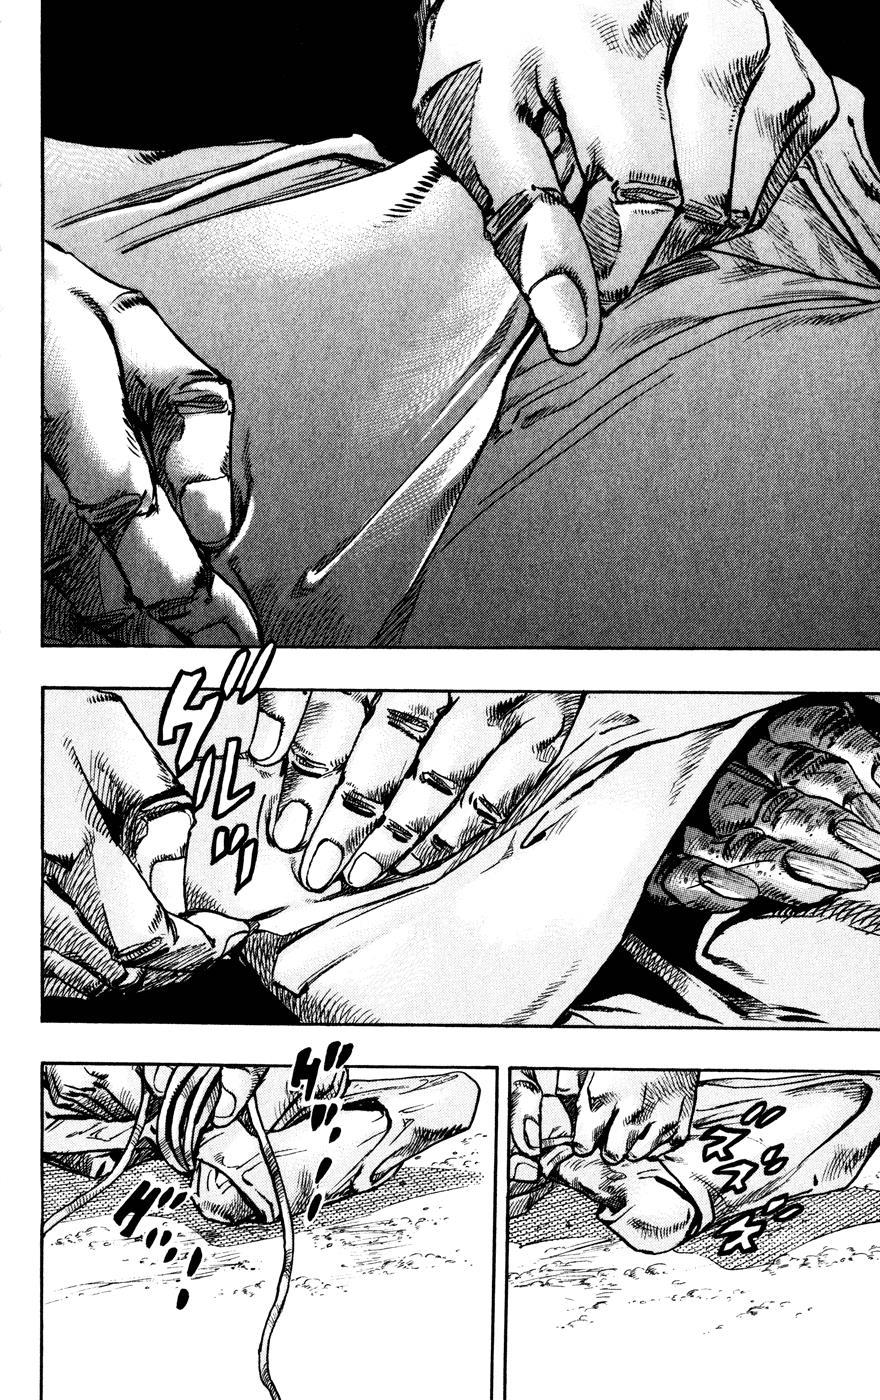 JoJo's Bizarre Adventure Part 7: Steel Ball Run Chapter 90 Page 2